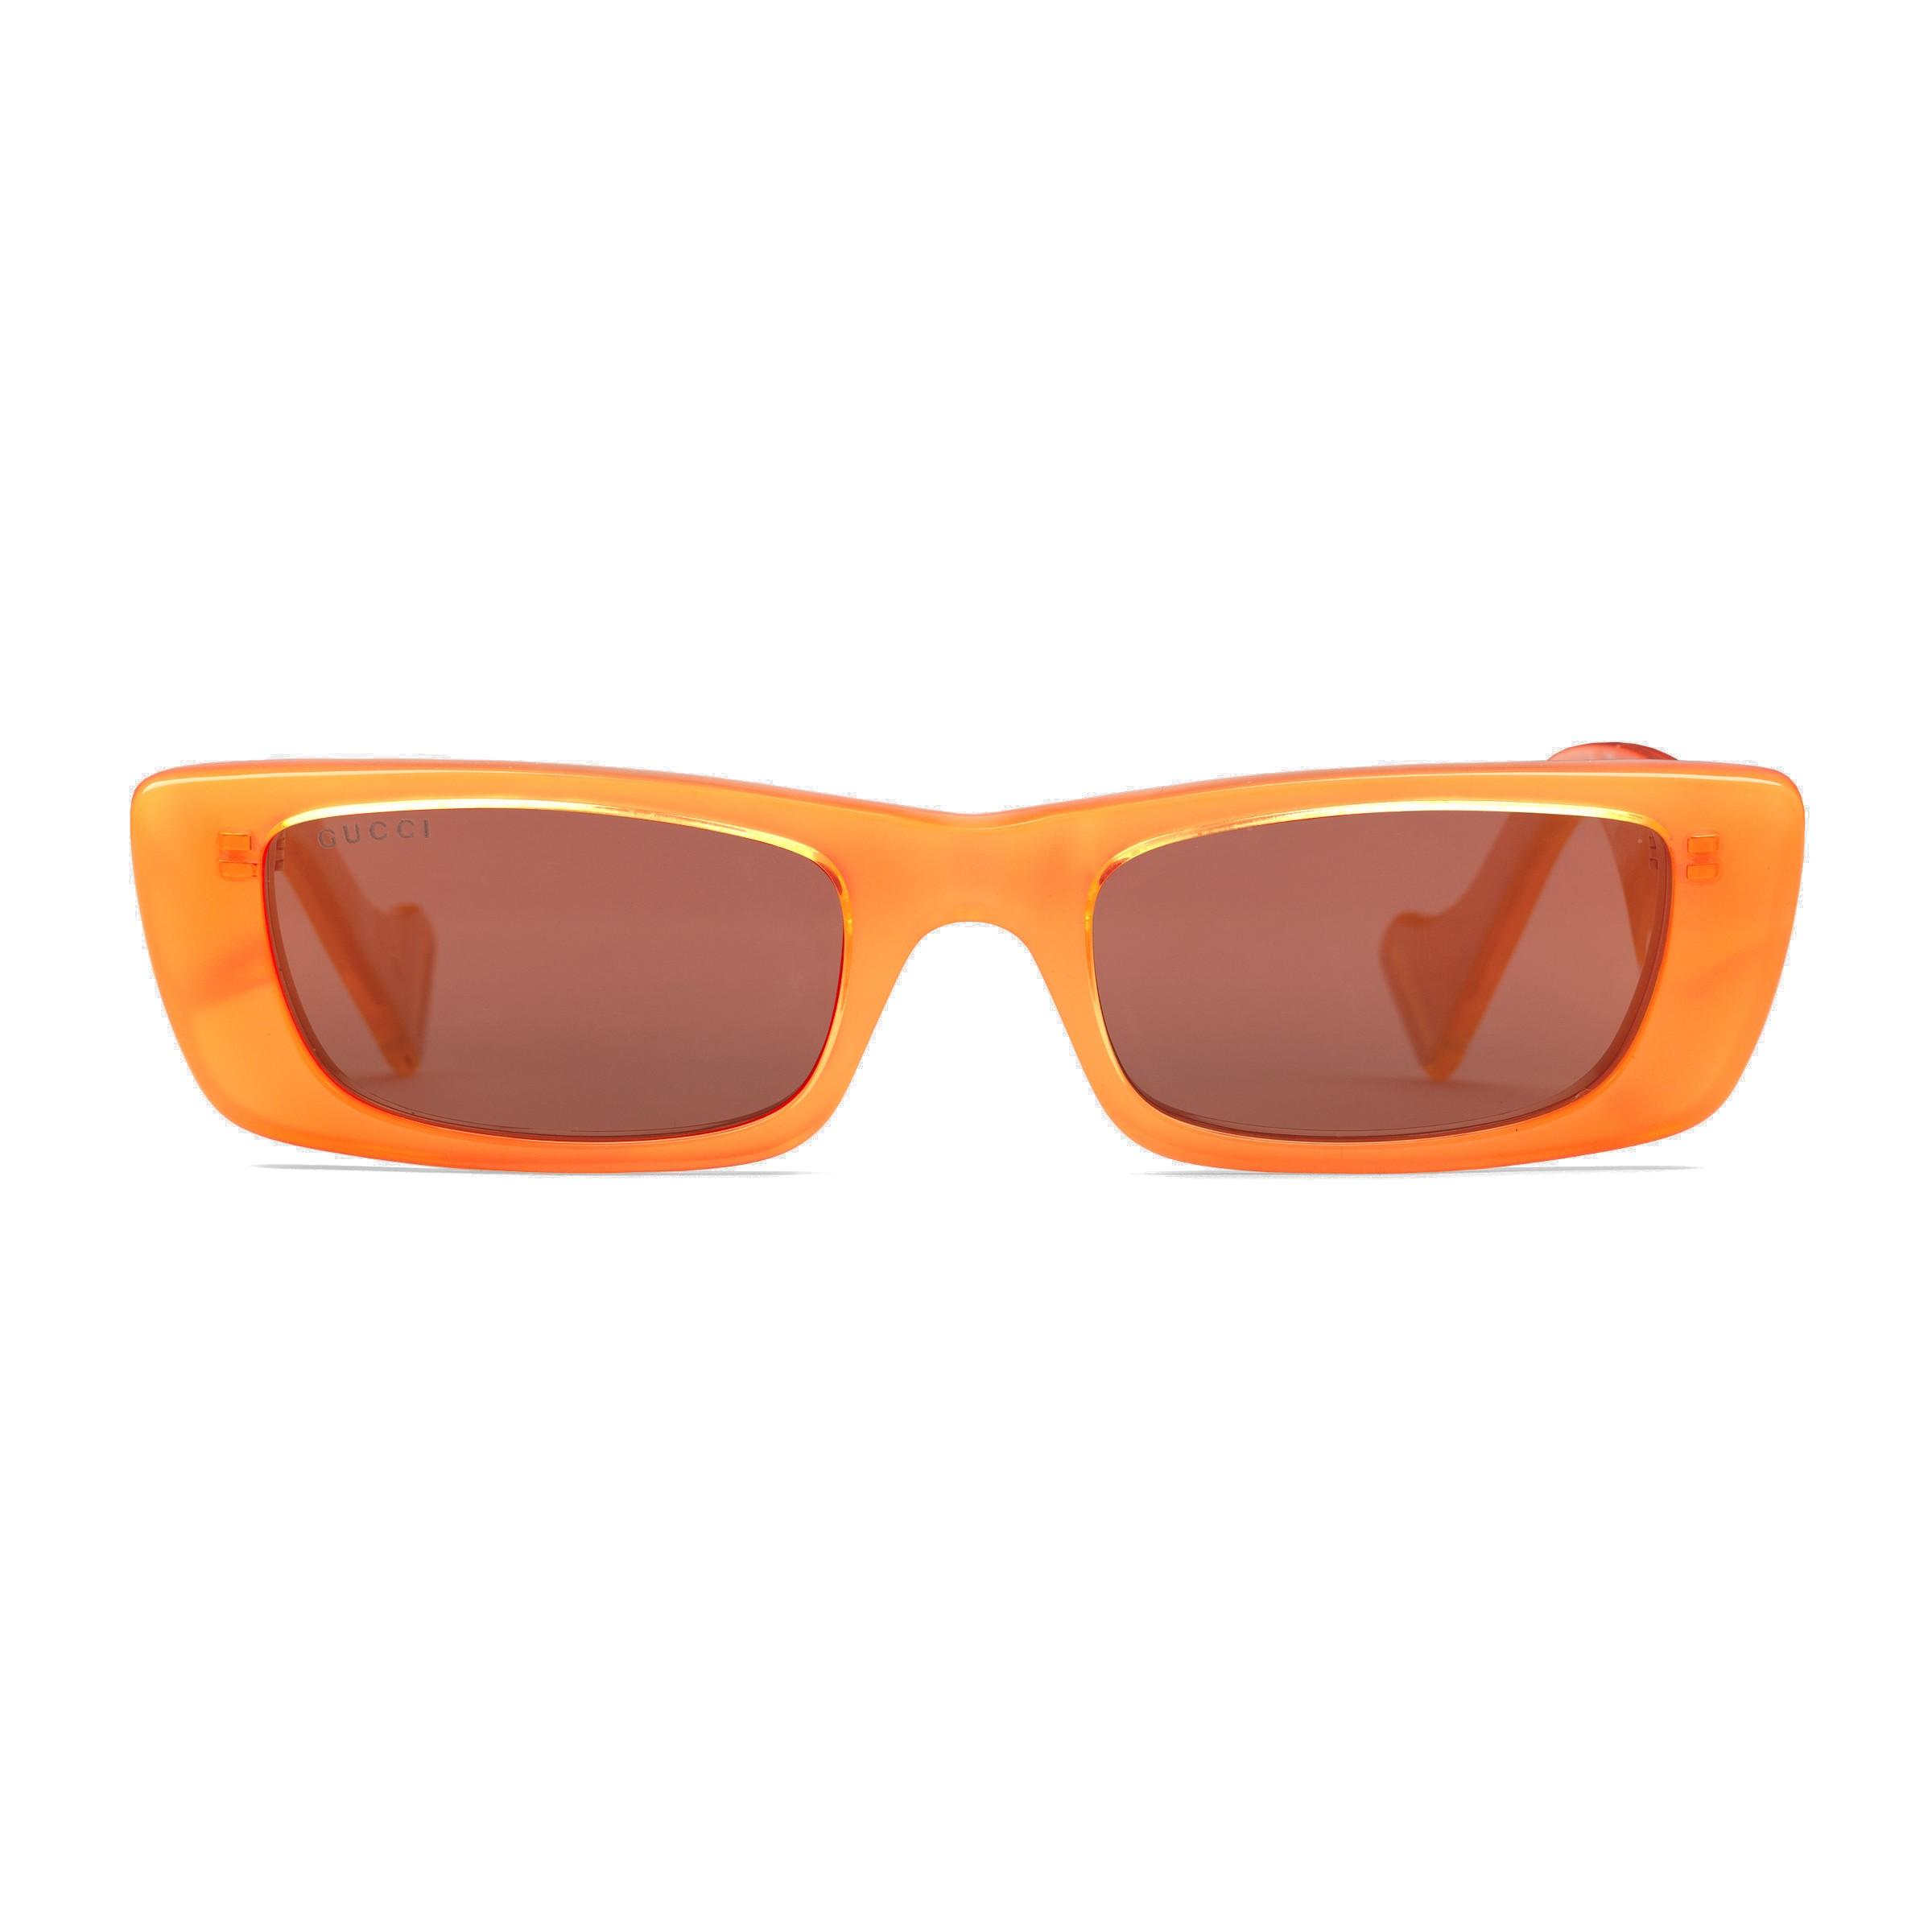 be9aed1d Gucci - Rectangular Sunglasses - Orange Fluo - Gucci Eyewear ...